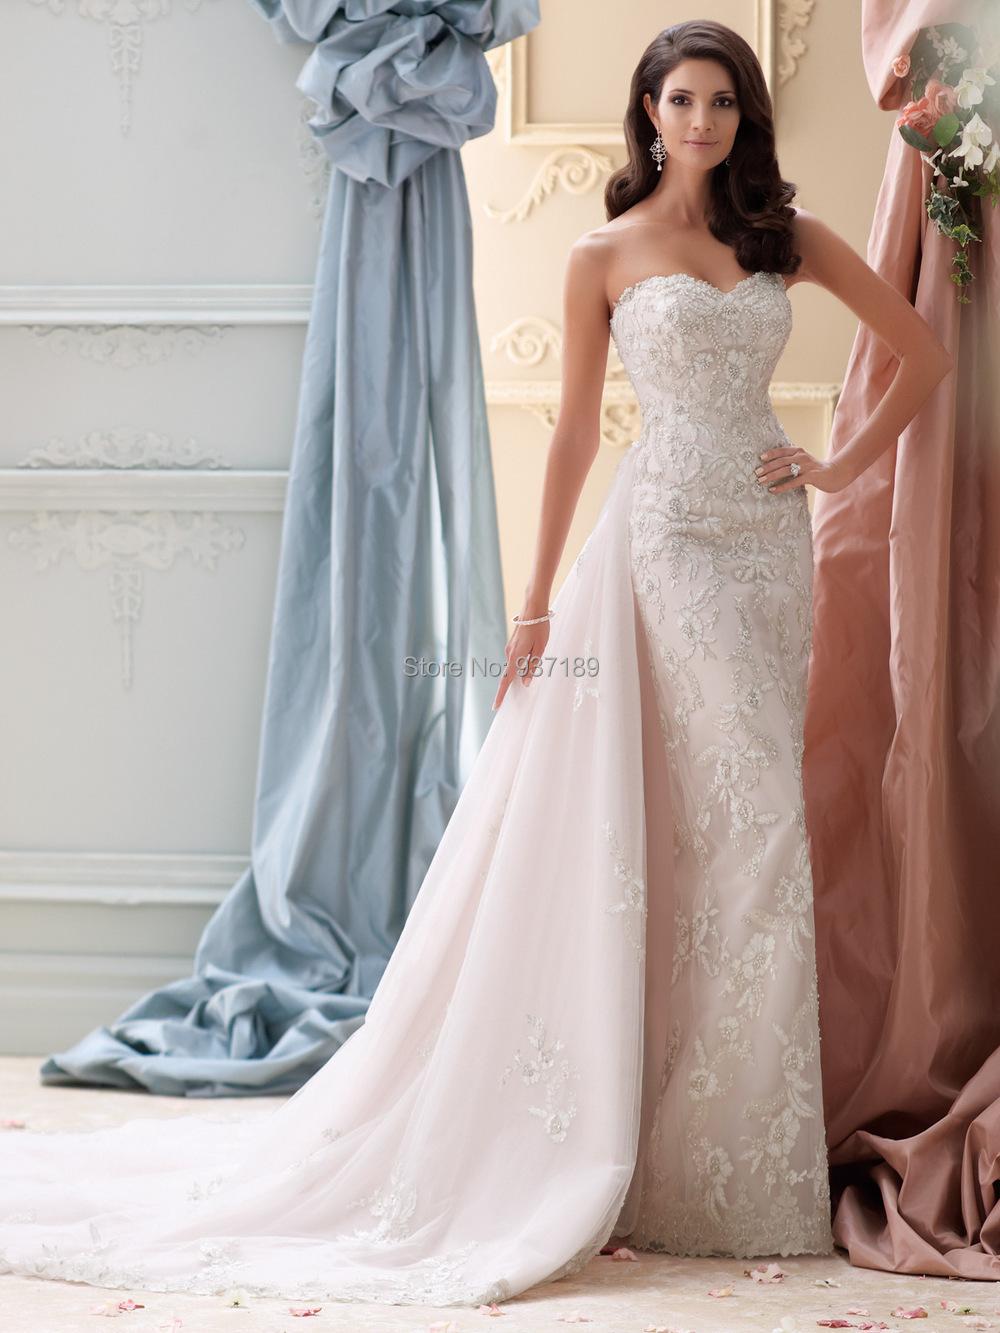 Mermaid Wedding Dress With Detachable Train : Latest design hot summer new mermaid lace wedding